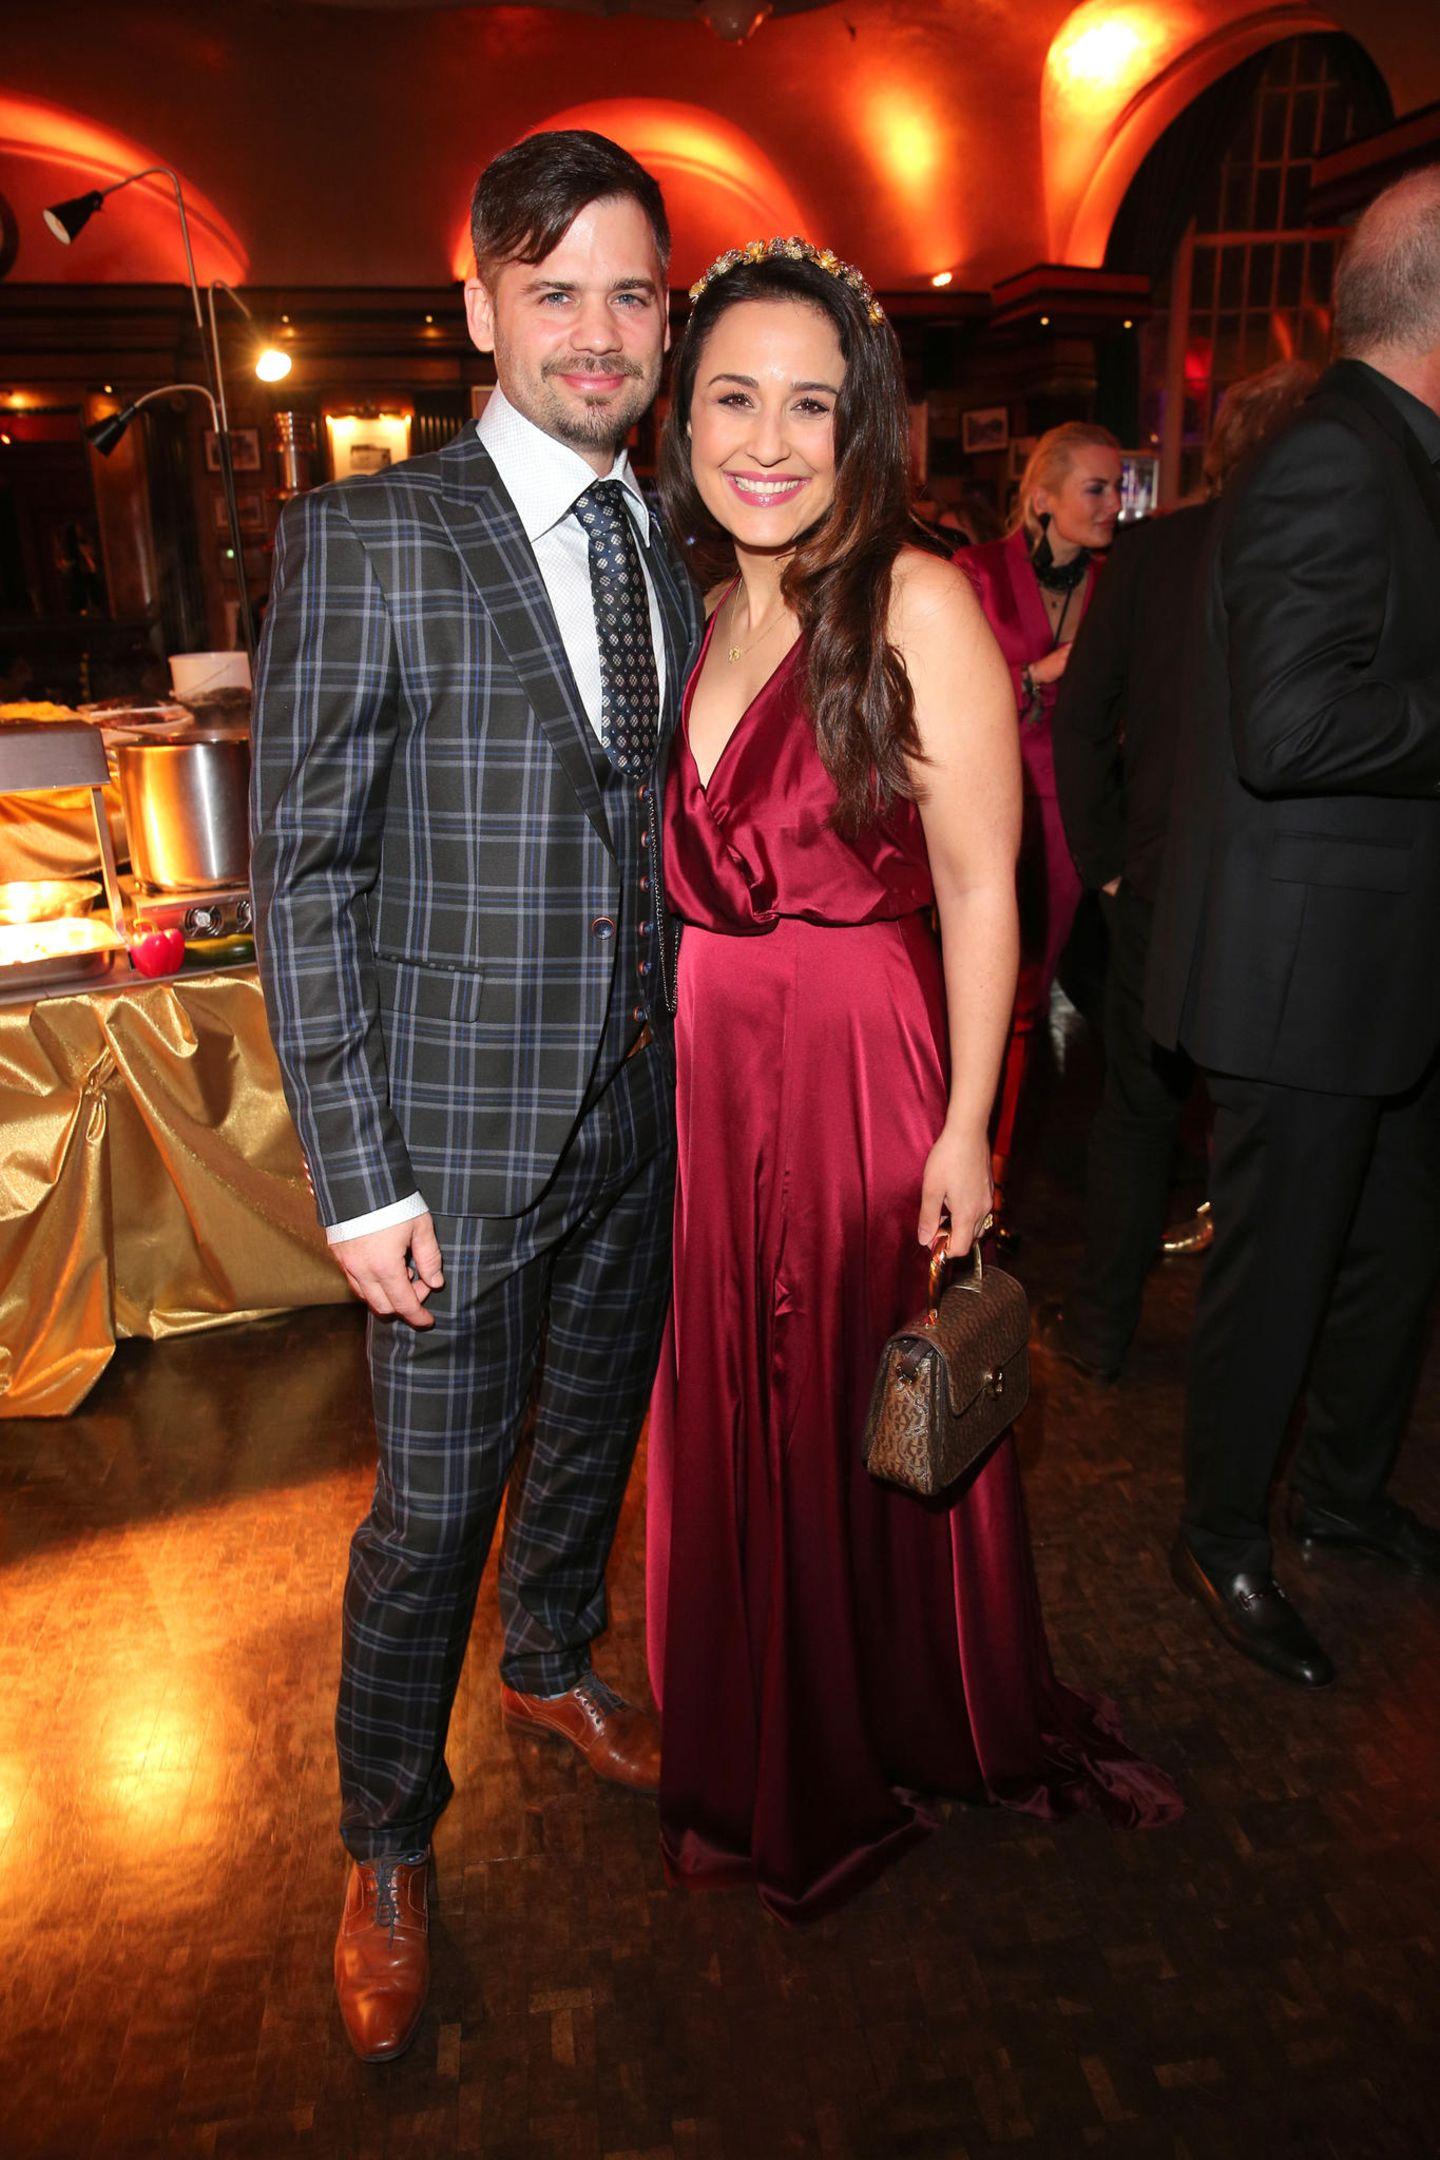 Promi-Trennungen 2020: Dominik Kowalski und Nina Moghaddam